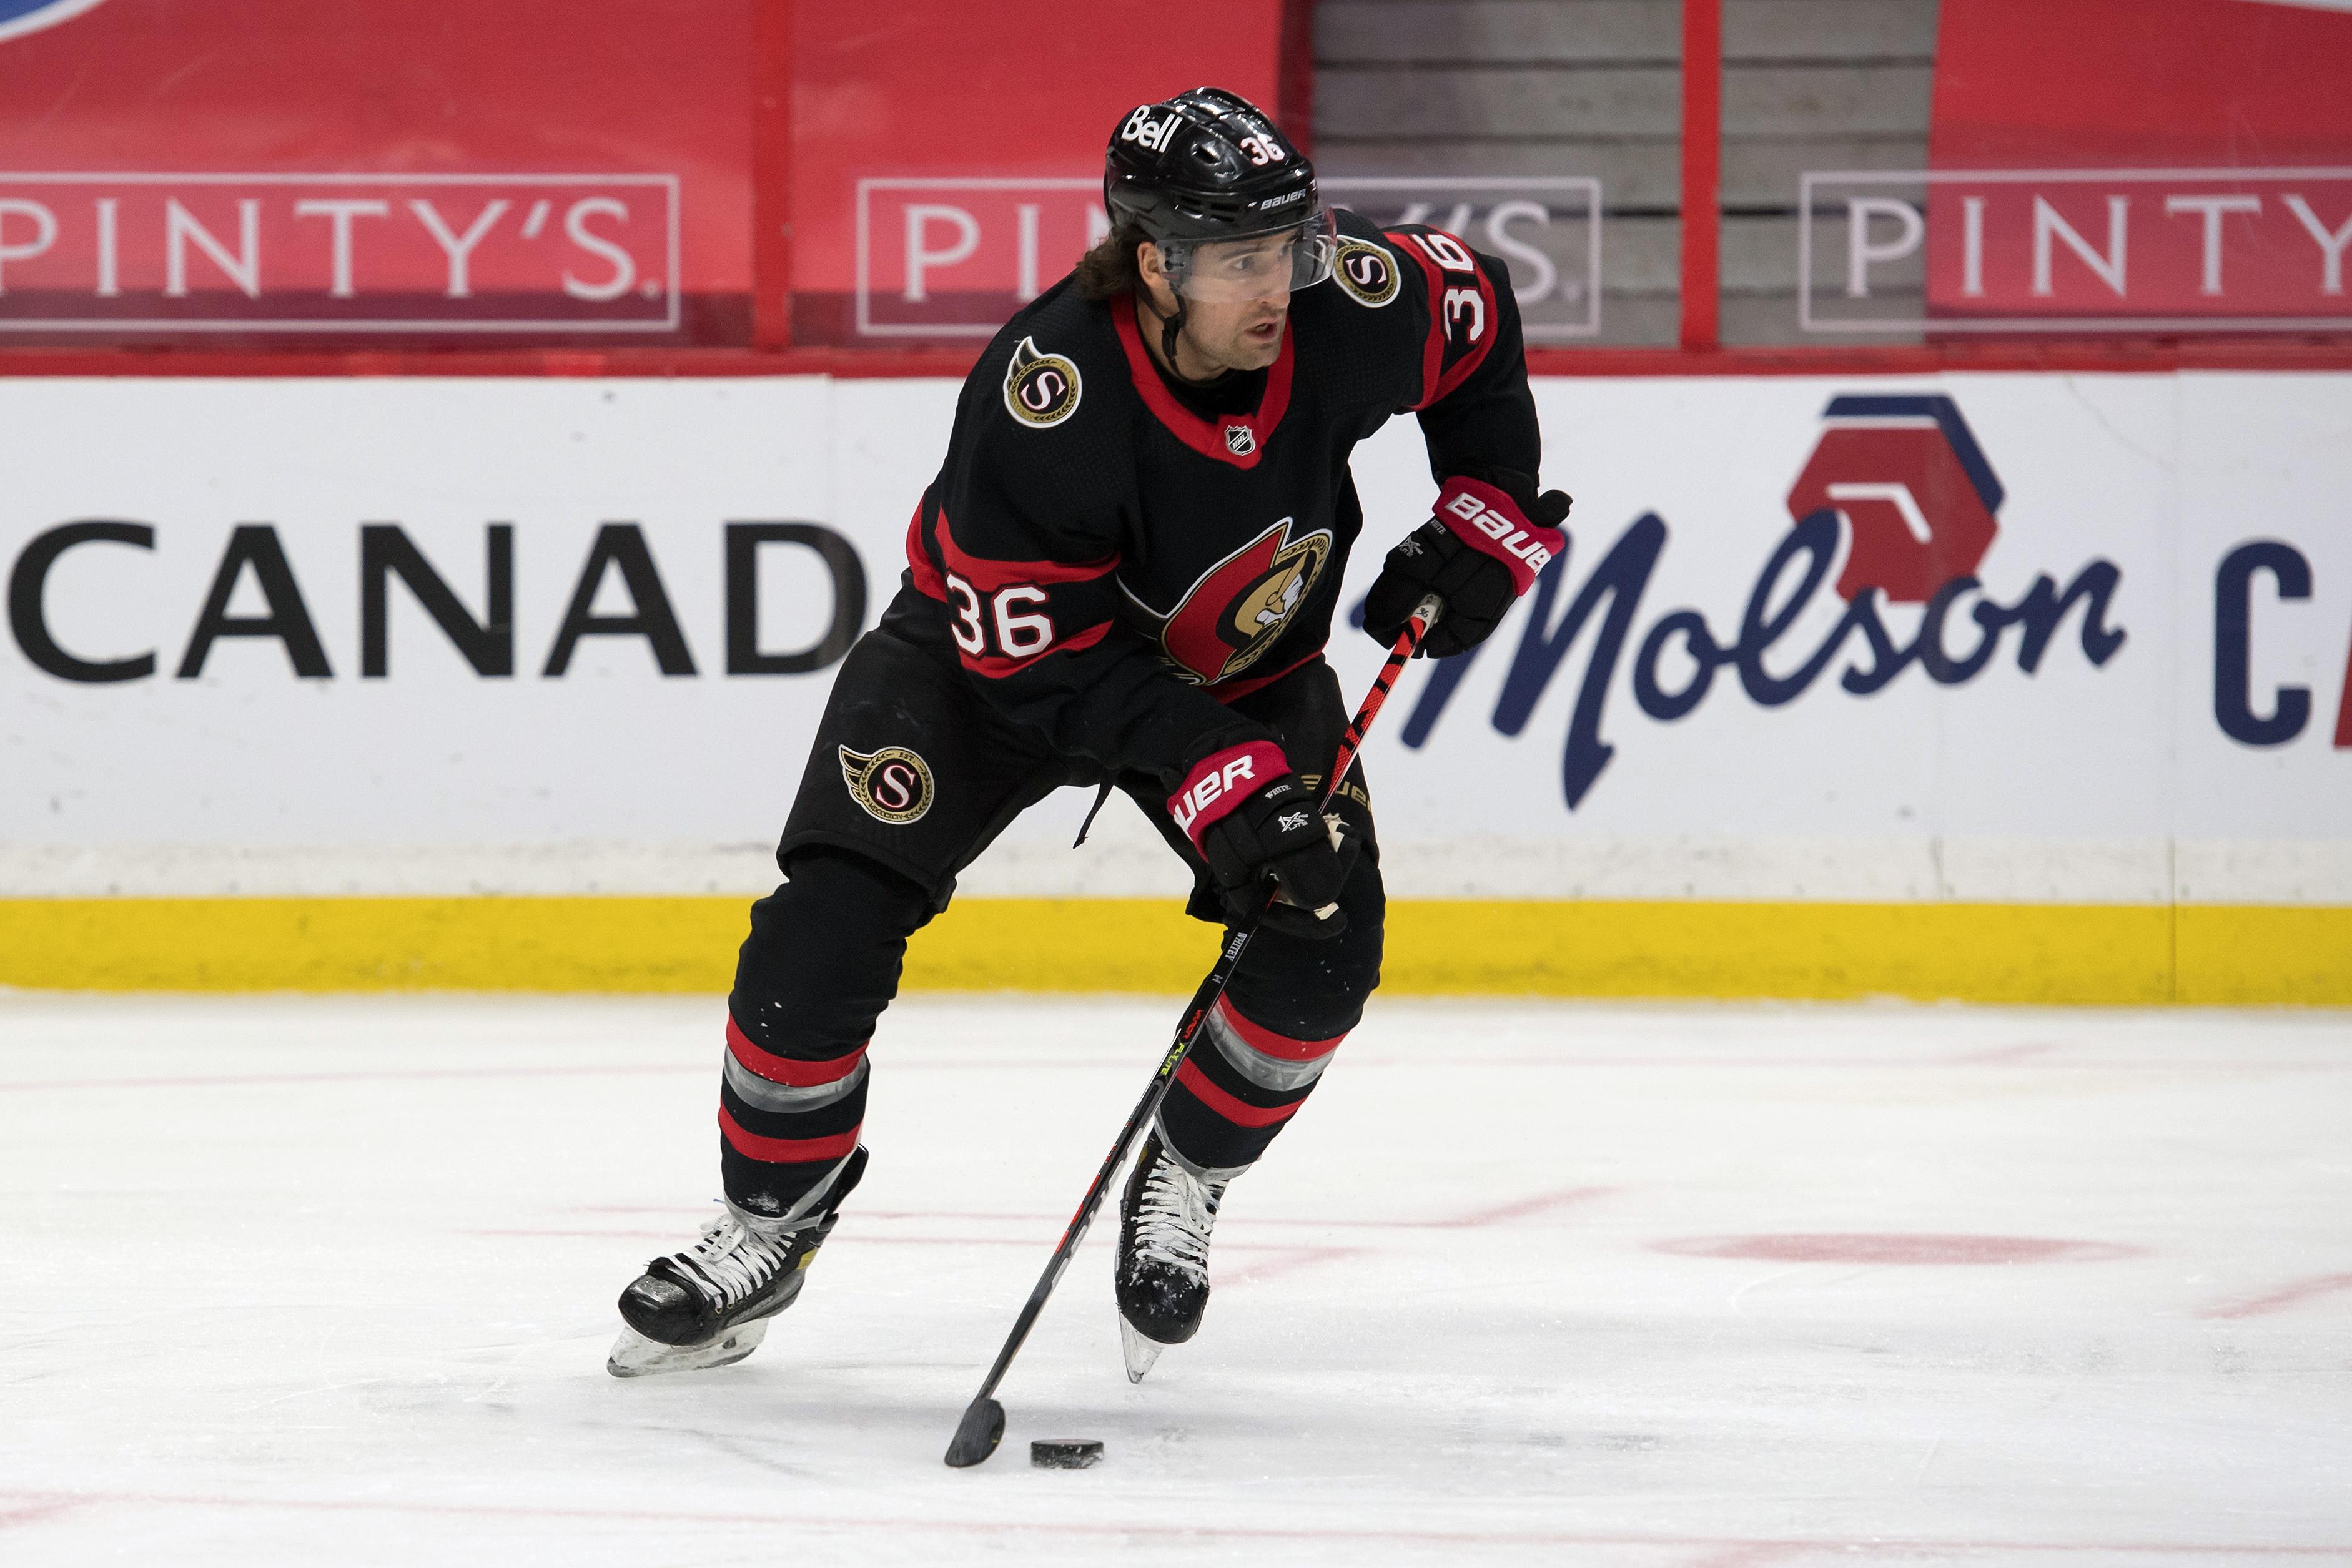 NHL: Calgary Flames at Ottawa Senators